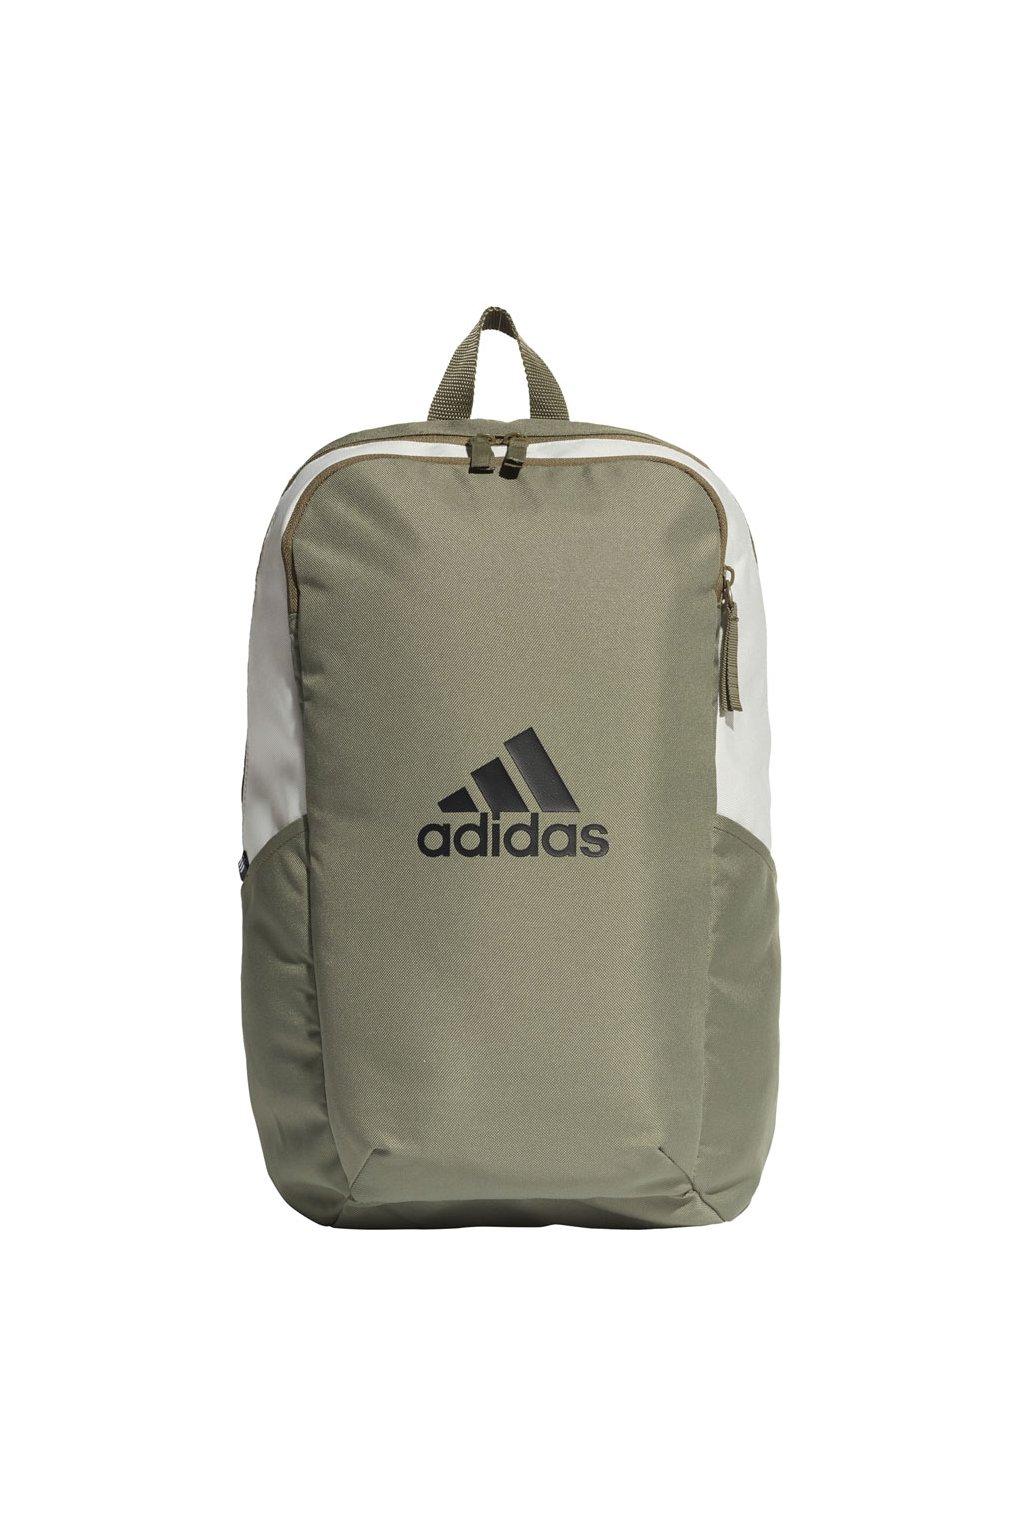 Batoh adidas Parkhood Bag olivový DU1994